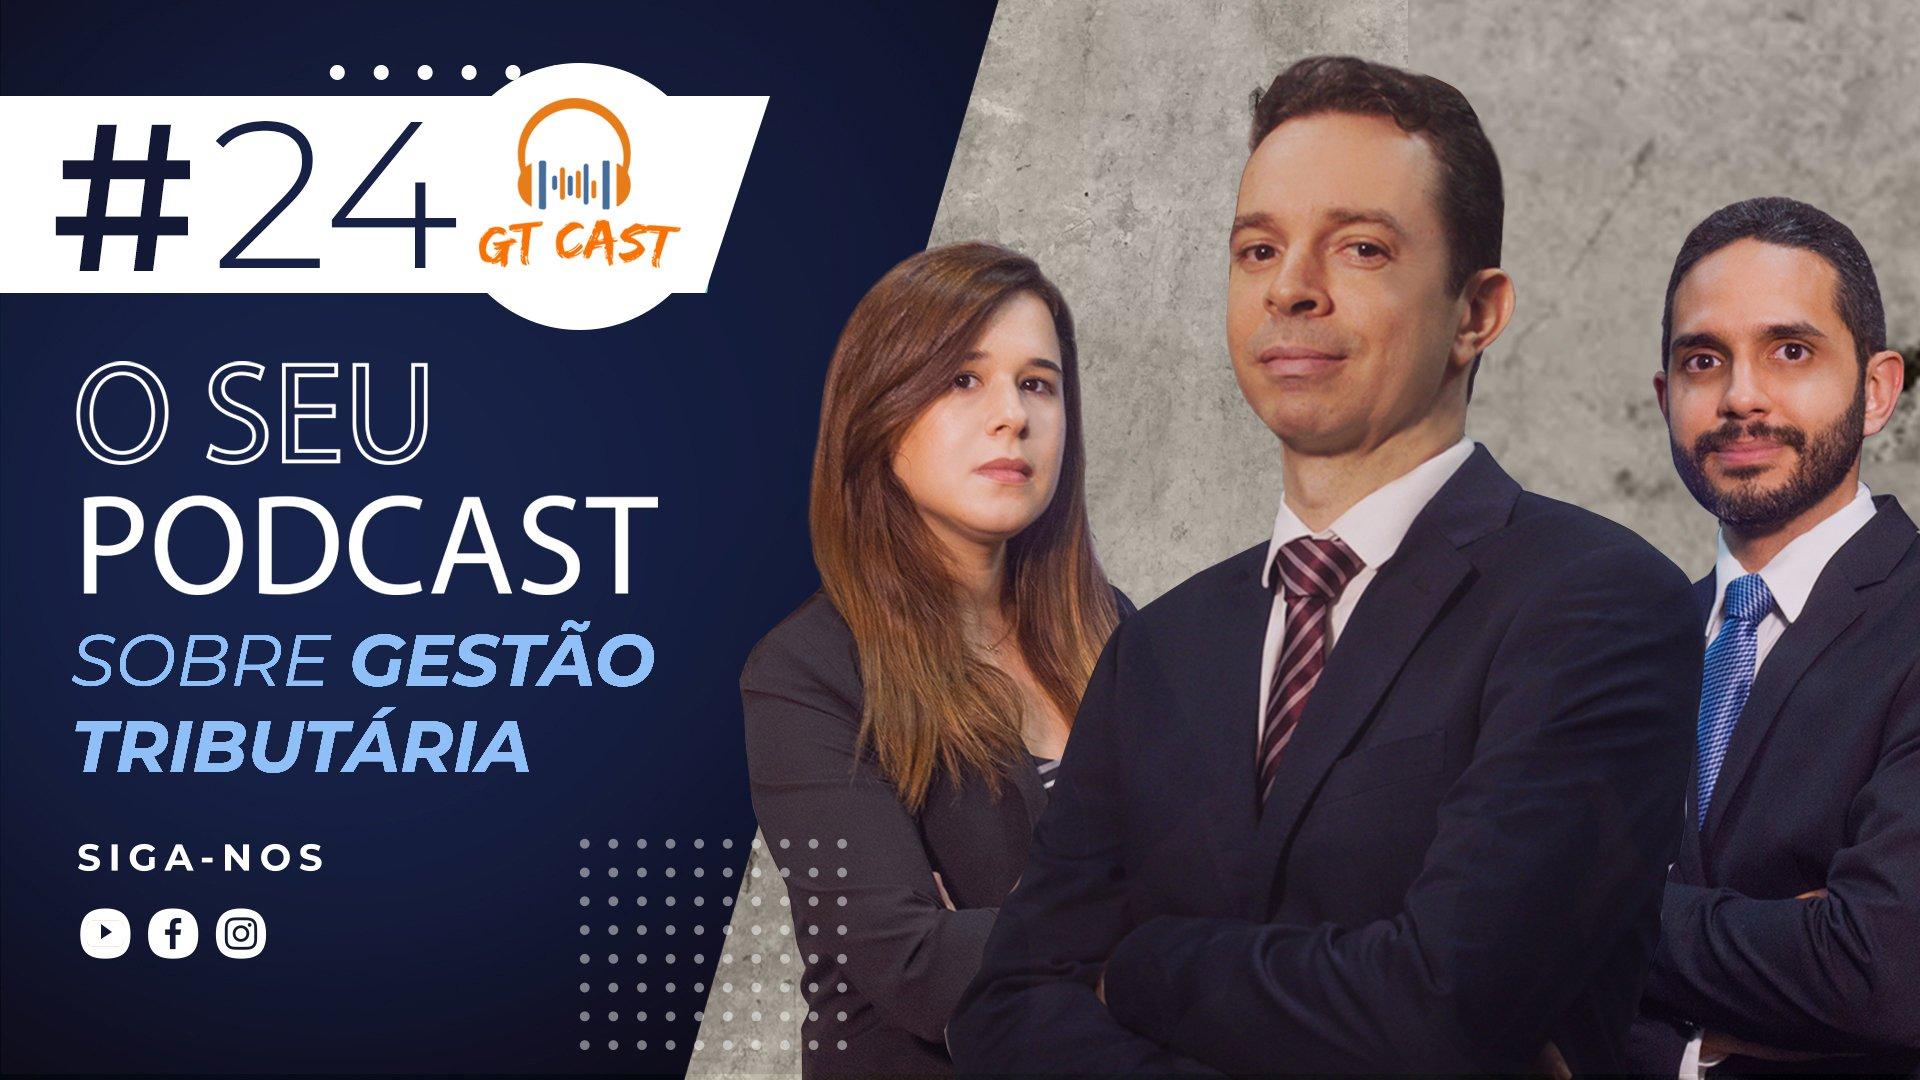 gt-cast-24-dezembro-2020-o-seu-podcast-sobre-gestao-tributaria